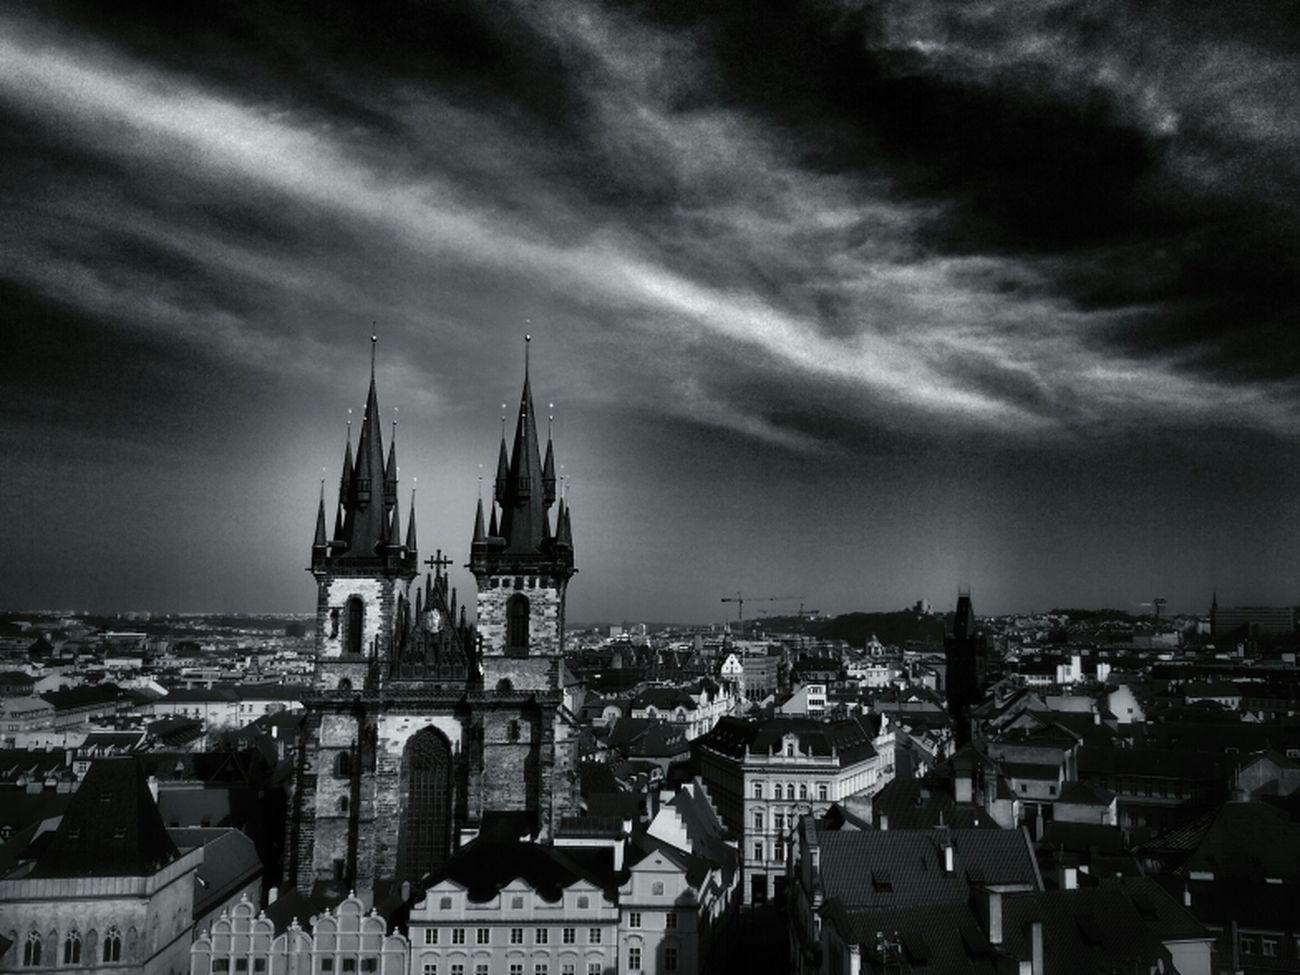 Týn Church Bws_worldwide Eye4photography  Hot_shotz Bwstyles_gf Bw_collection Blackandwhite Monochrome